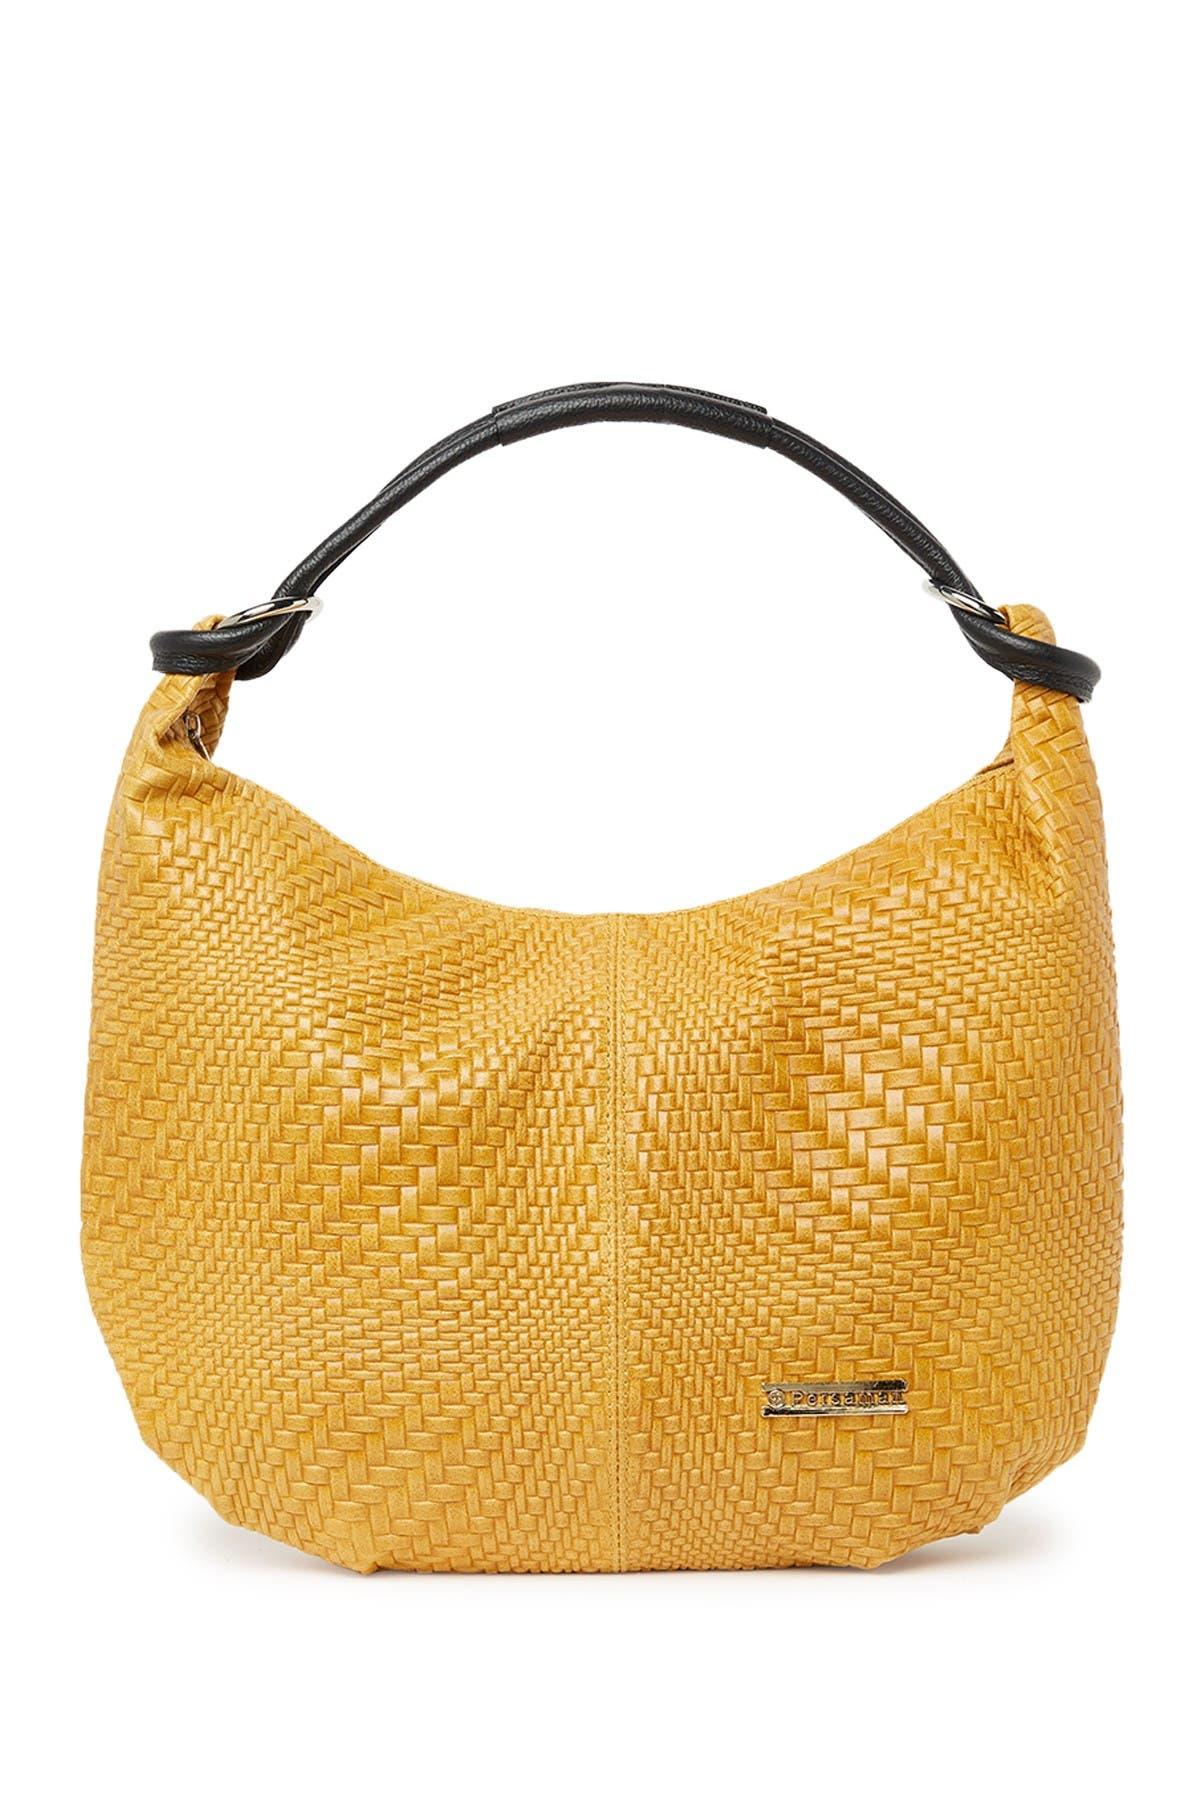 Image of Persaman New York Alessandra Weave Shoulder Bag